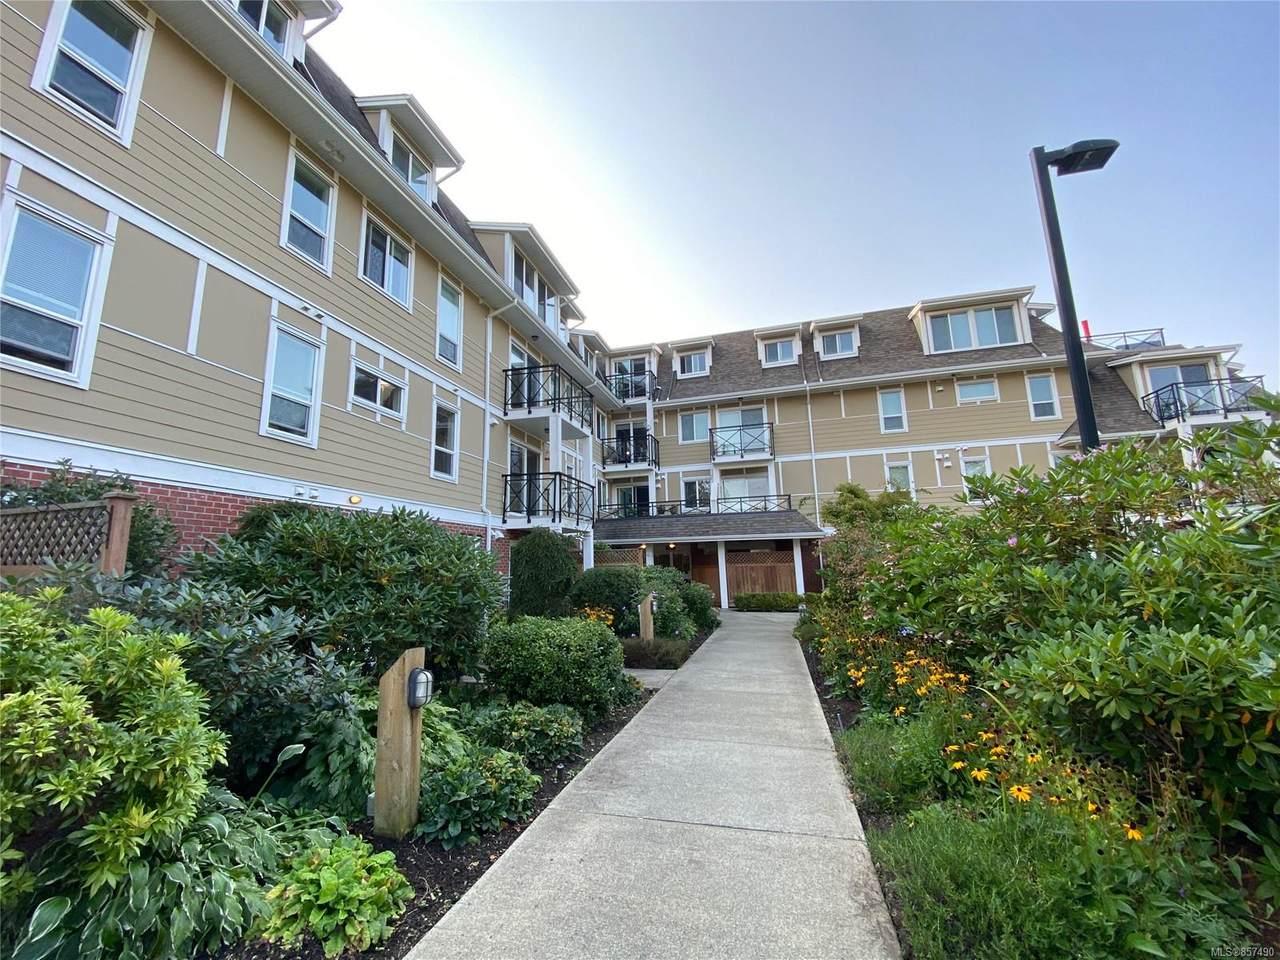 4536 Viewmont Ave - Photo 1